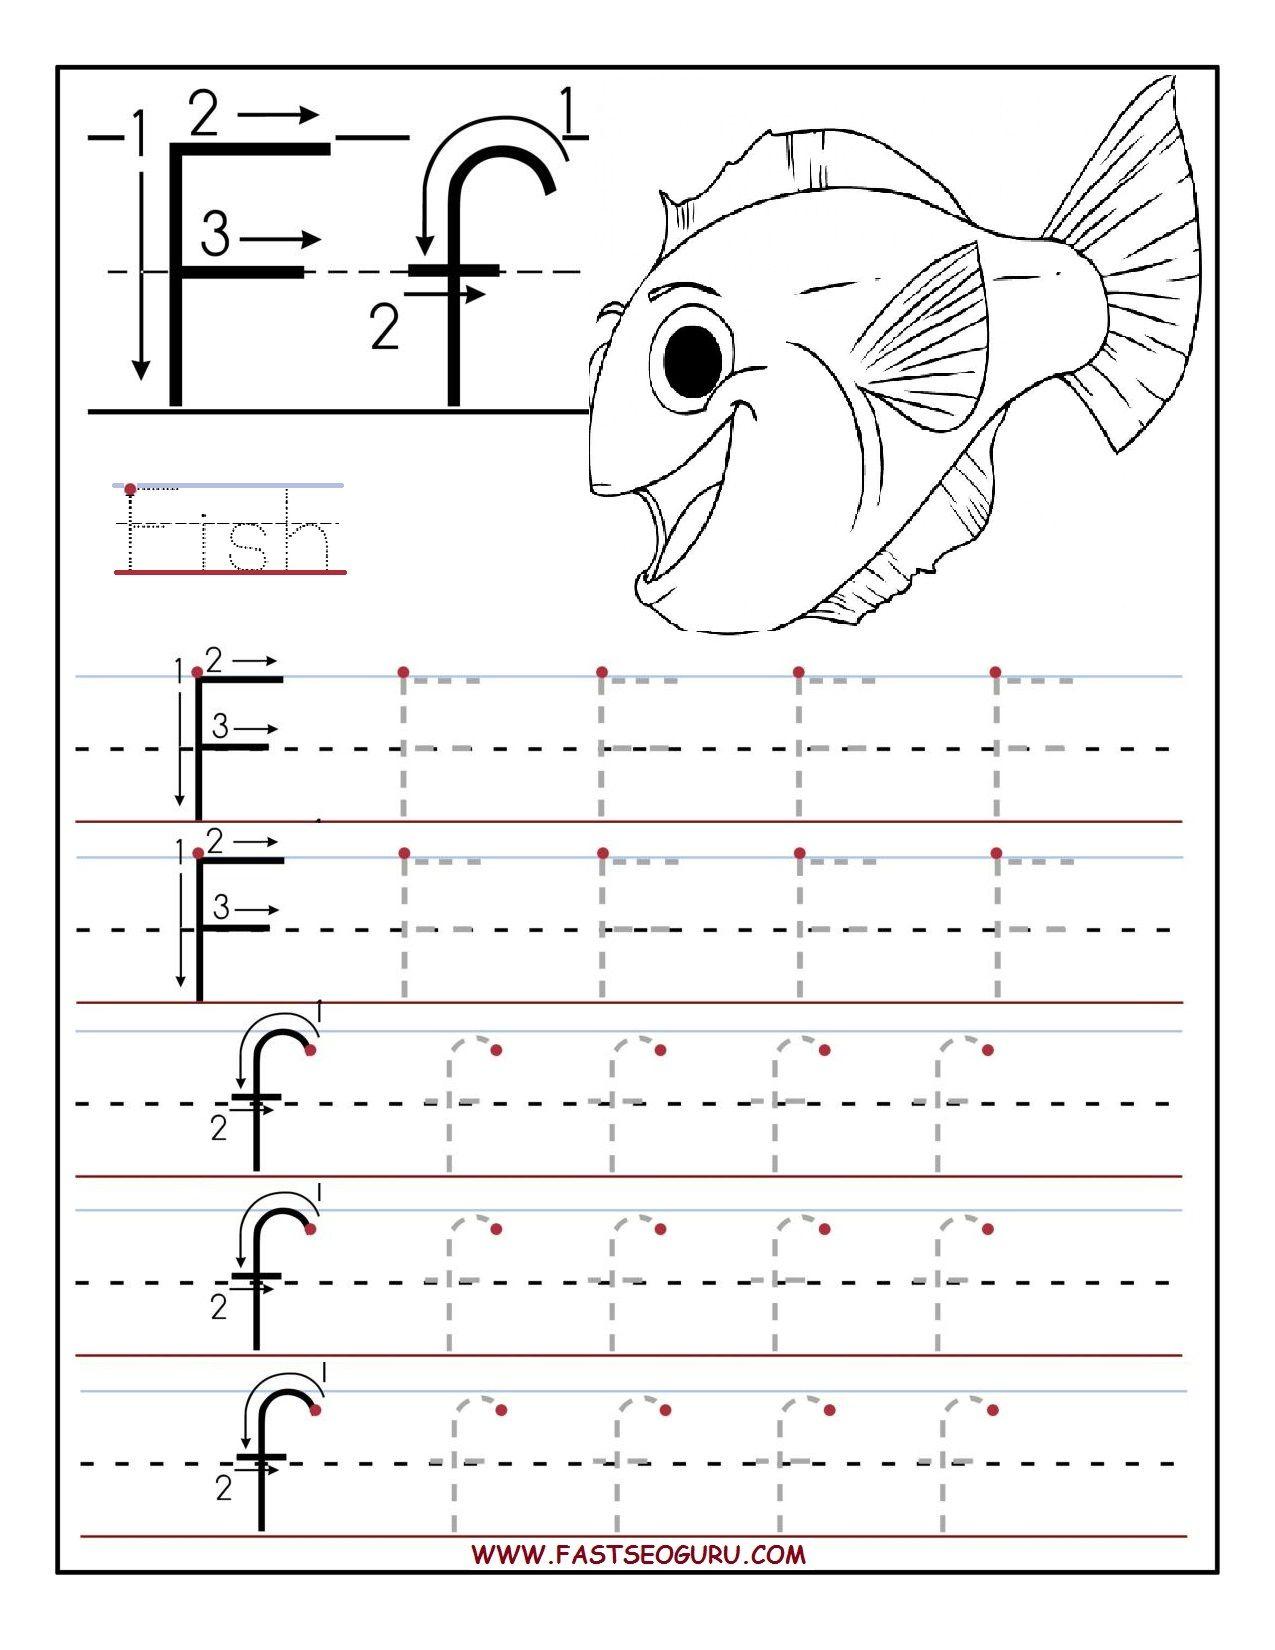 Printable Letter F Tracing Worksheets For Preschool regarding Letter Tracing Online